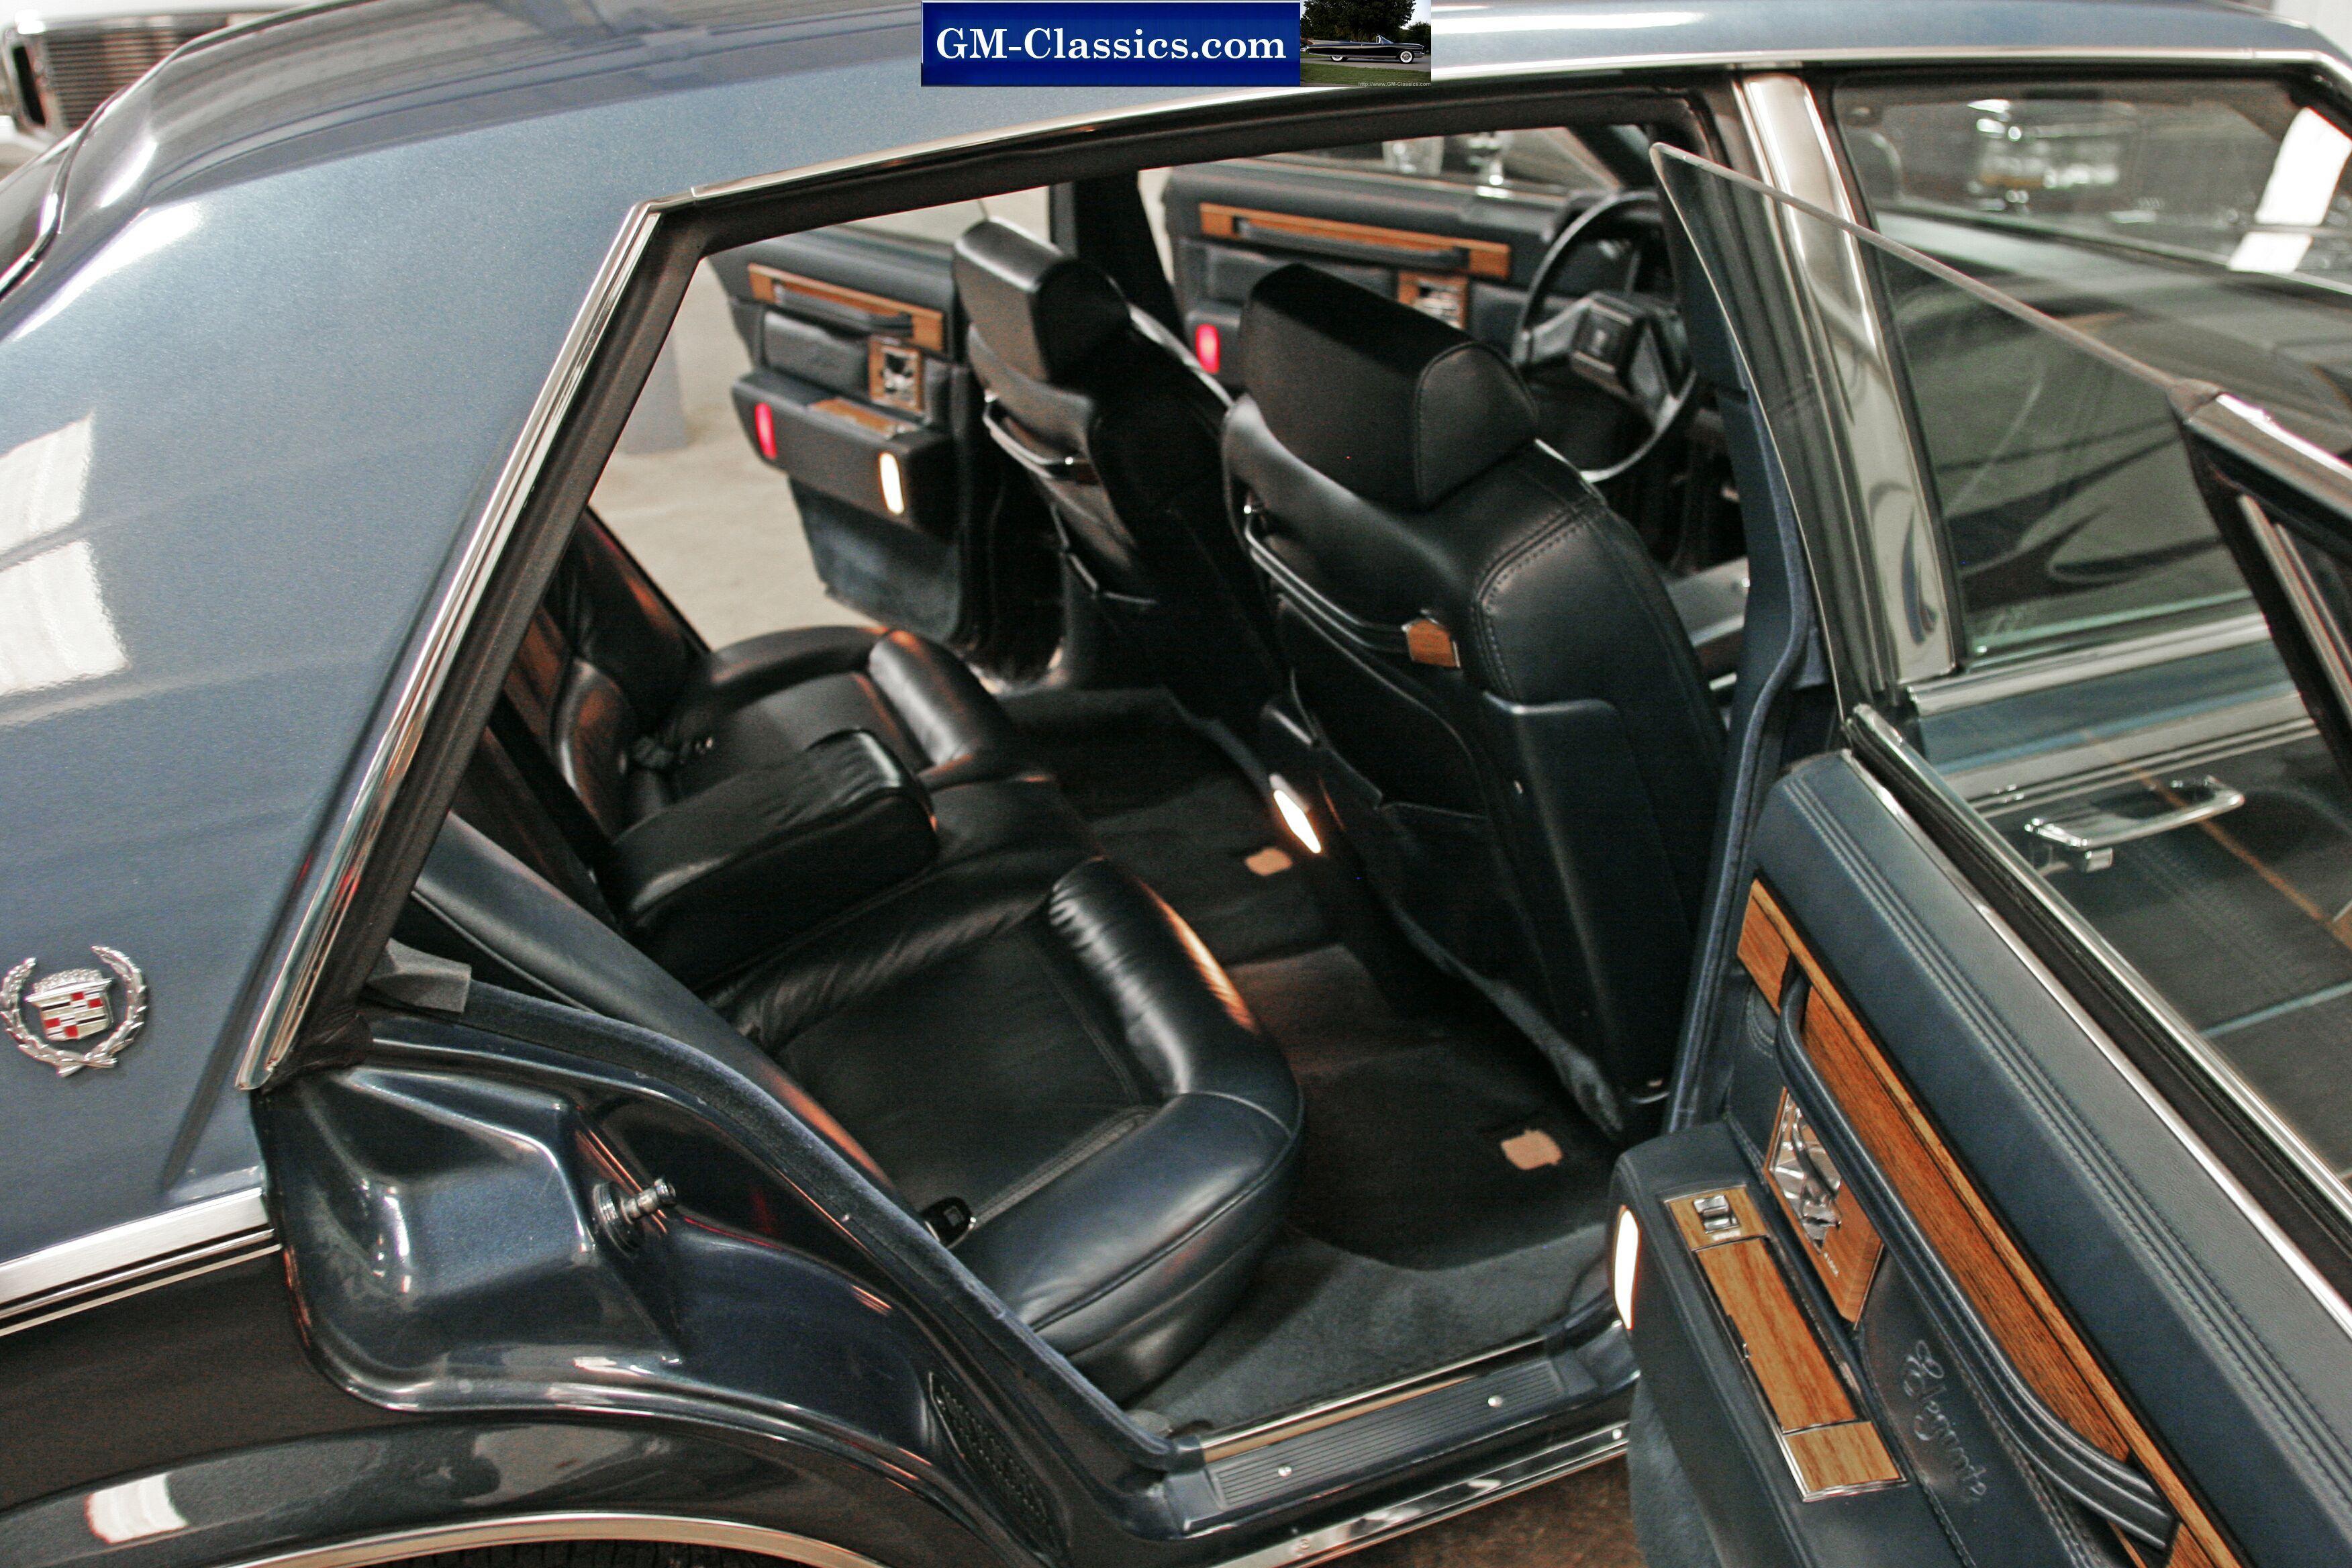 1985 Cadillac Seville Elegante A Project Caddy Pinterest